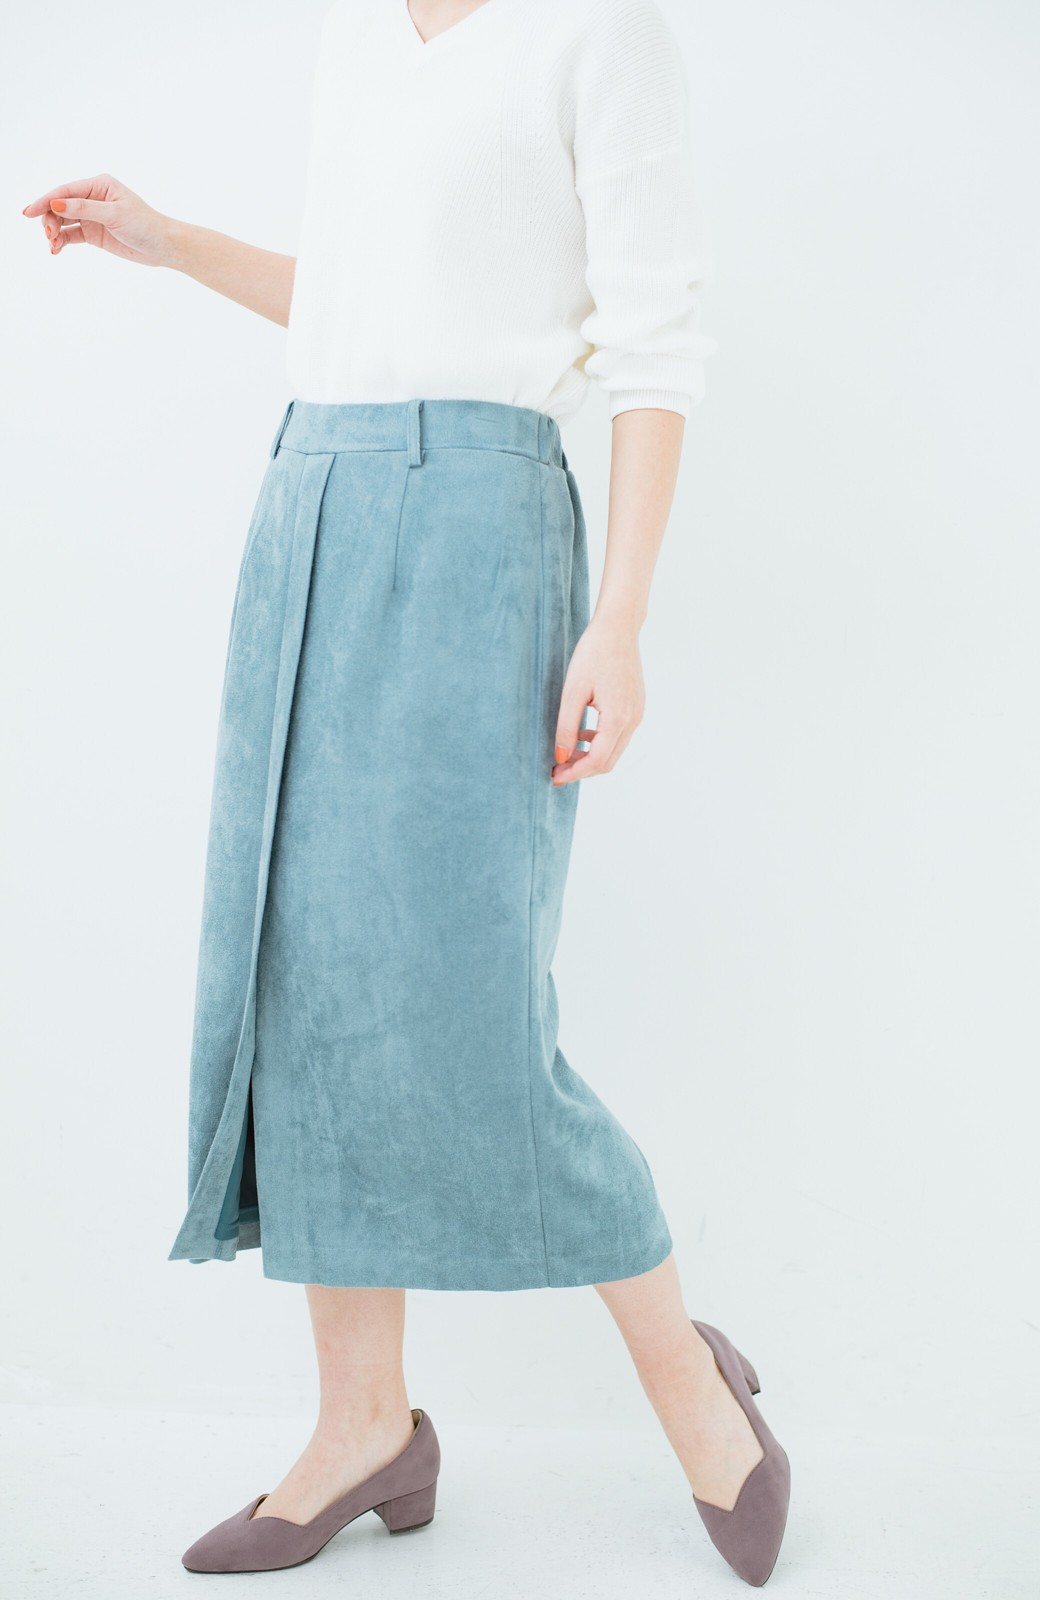 haco! 大人が安心して着られるタイトスカート by que made me <グレイッシュブルー>の商品写真3